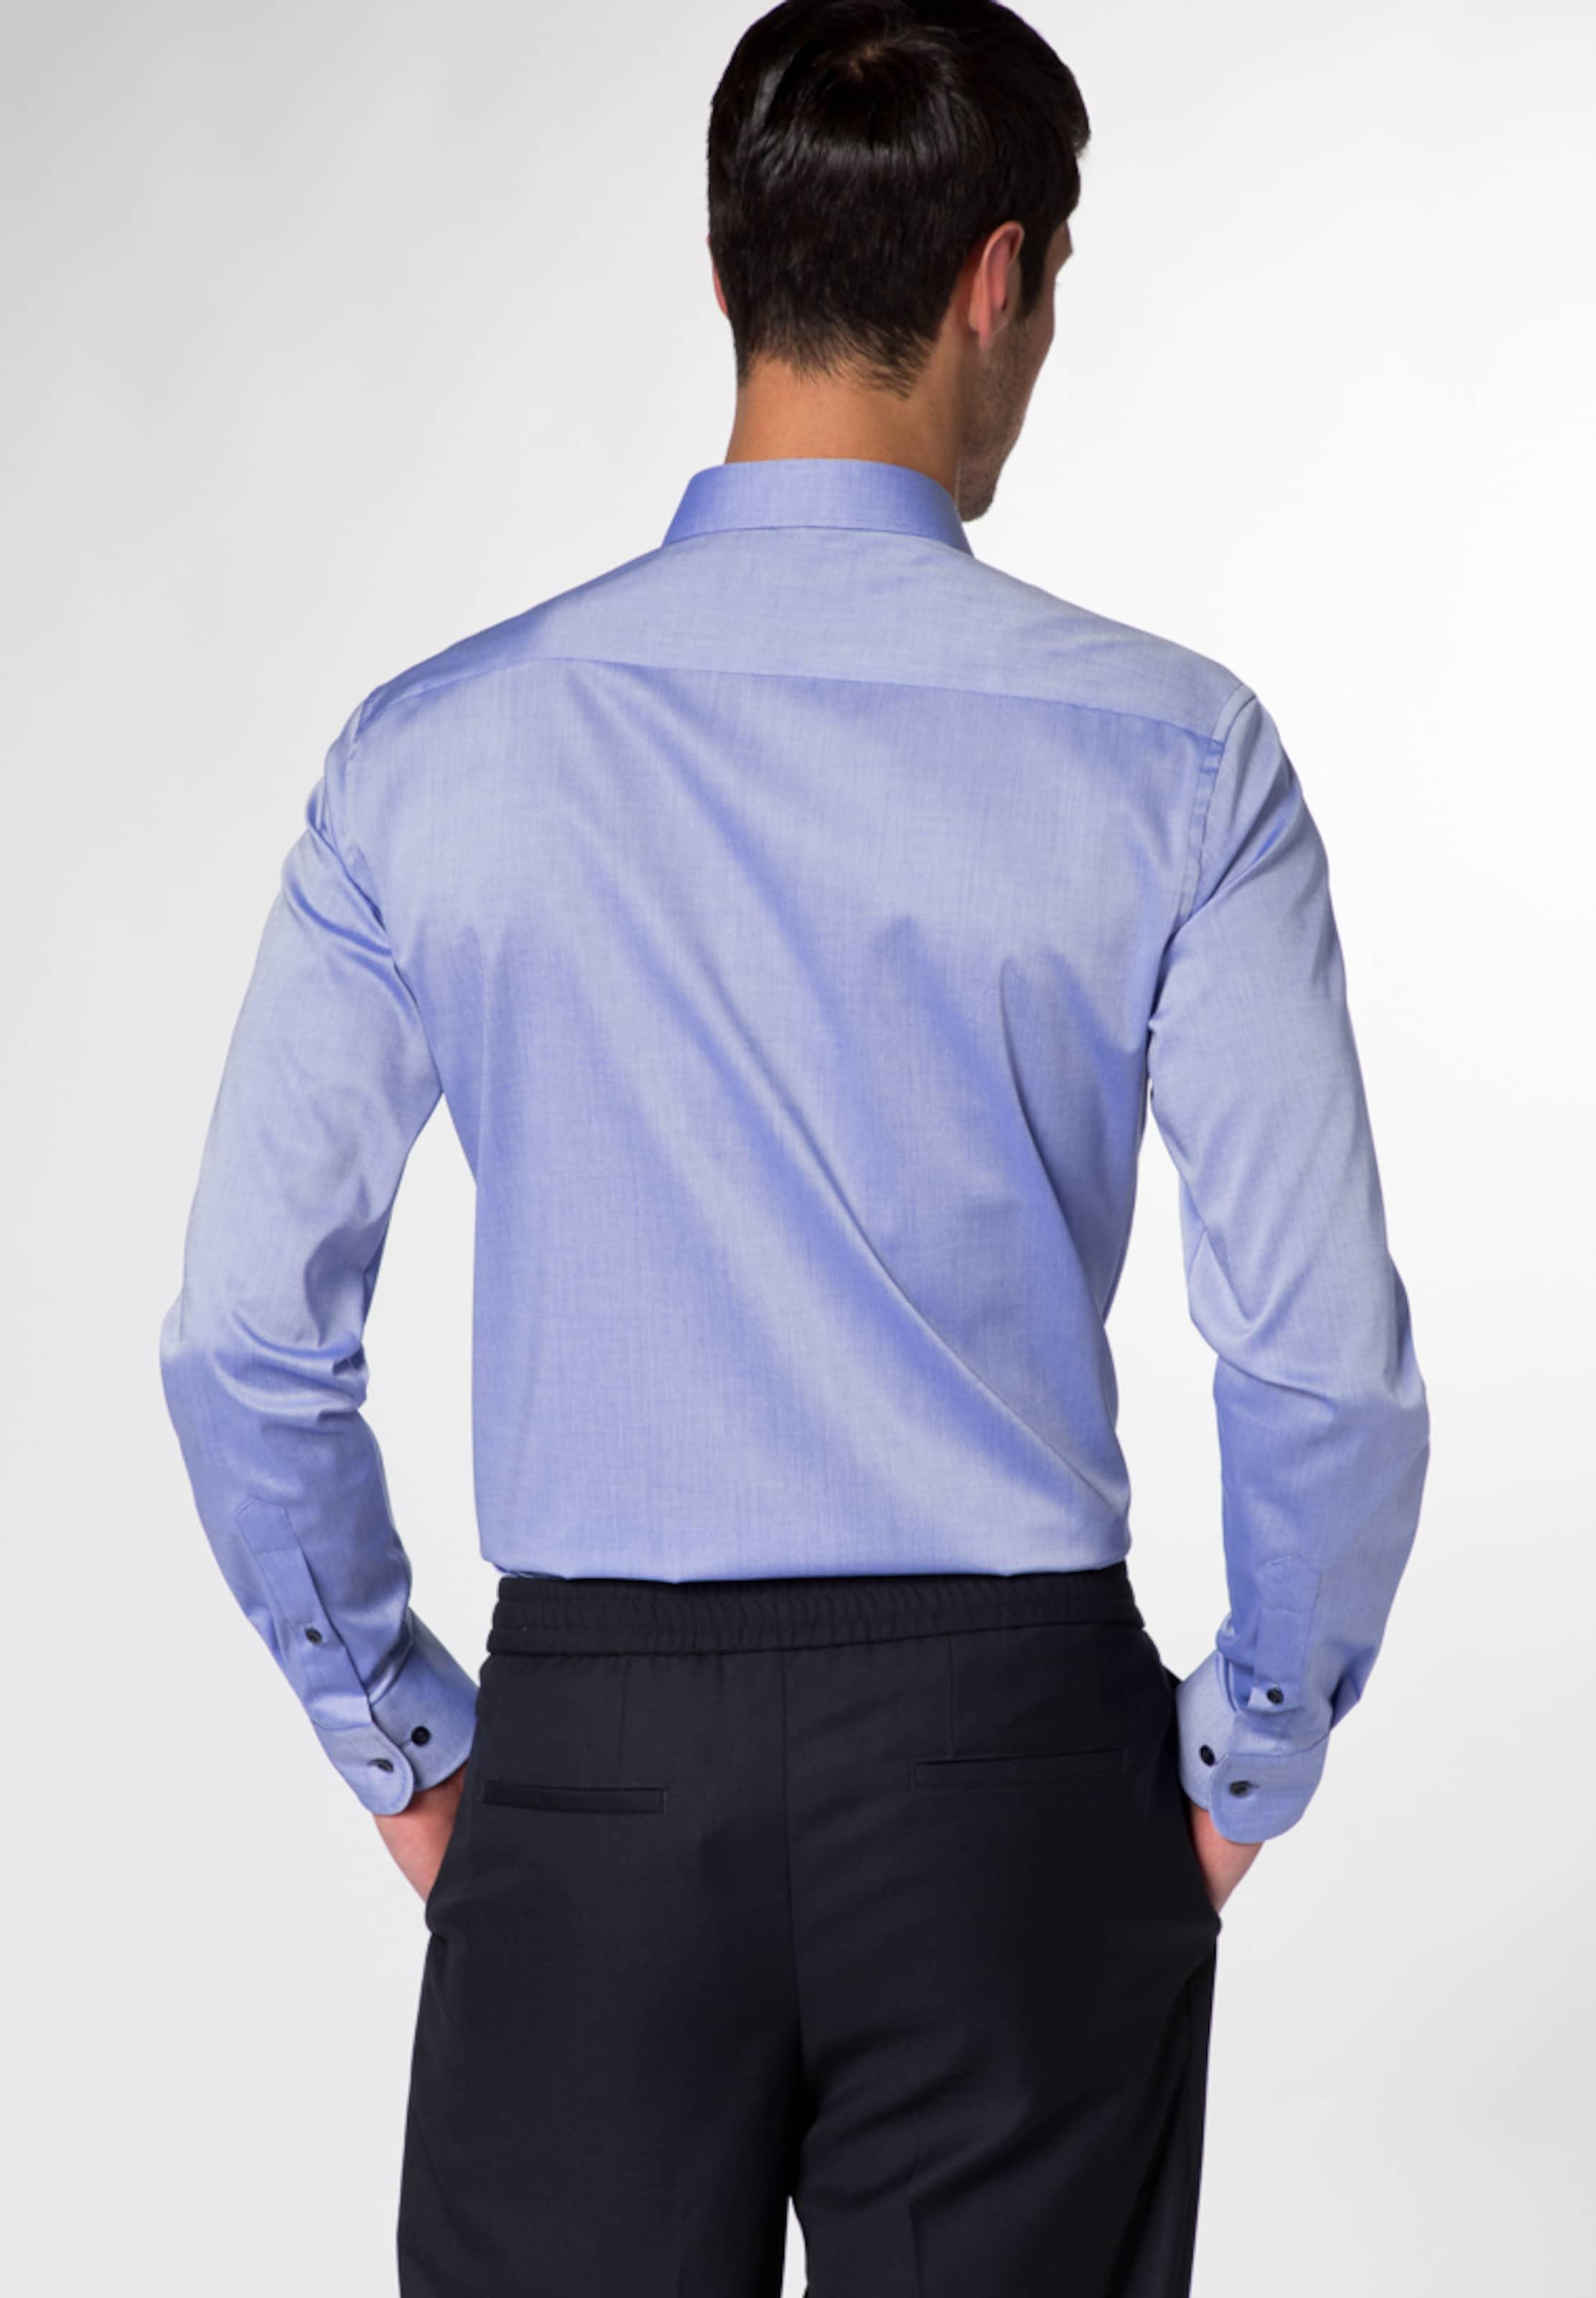 Factory Outlet Günstig Online Billig Verkauf Große Diskont ETERNA Langarm Hemd SLIM FIT nrcd2xO1